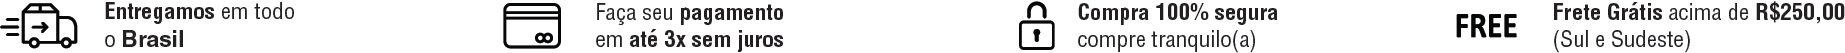 Tarja atualizada